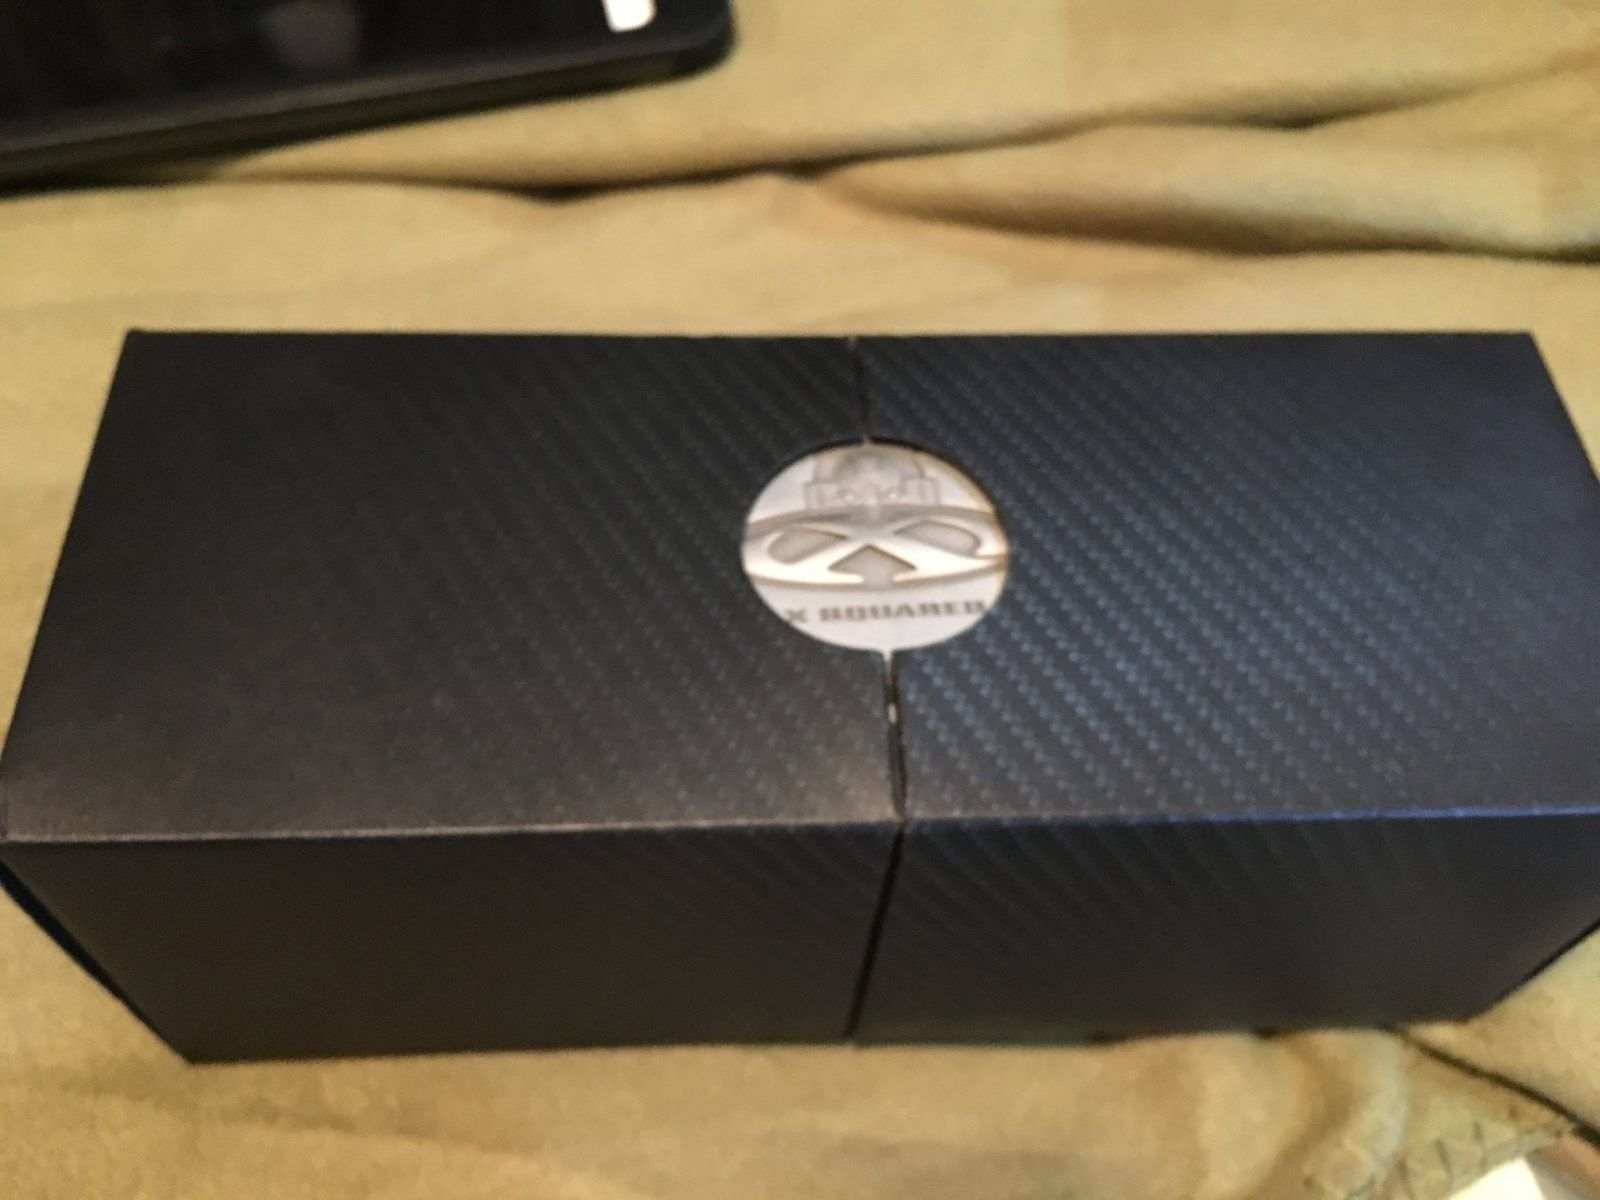 XS Box,  XS Coin & XM Case - 2016-04-03 19.32.54.jpg